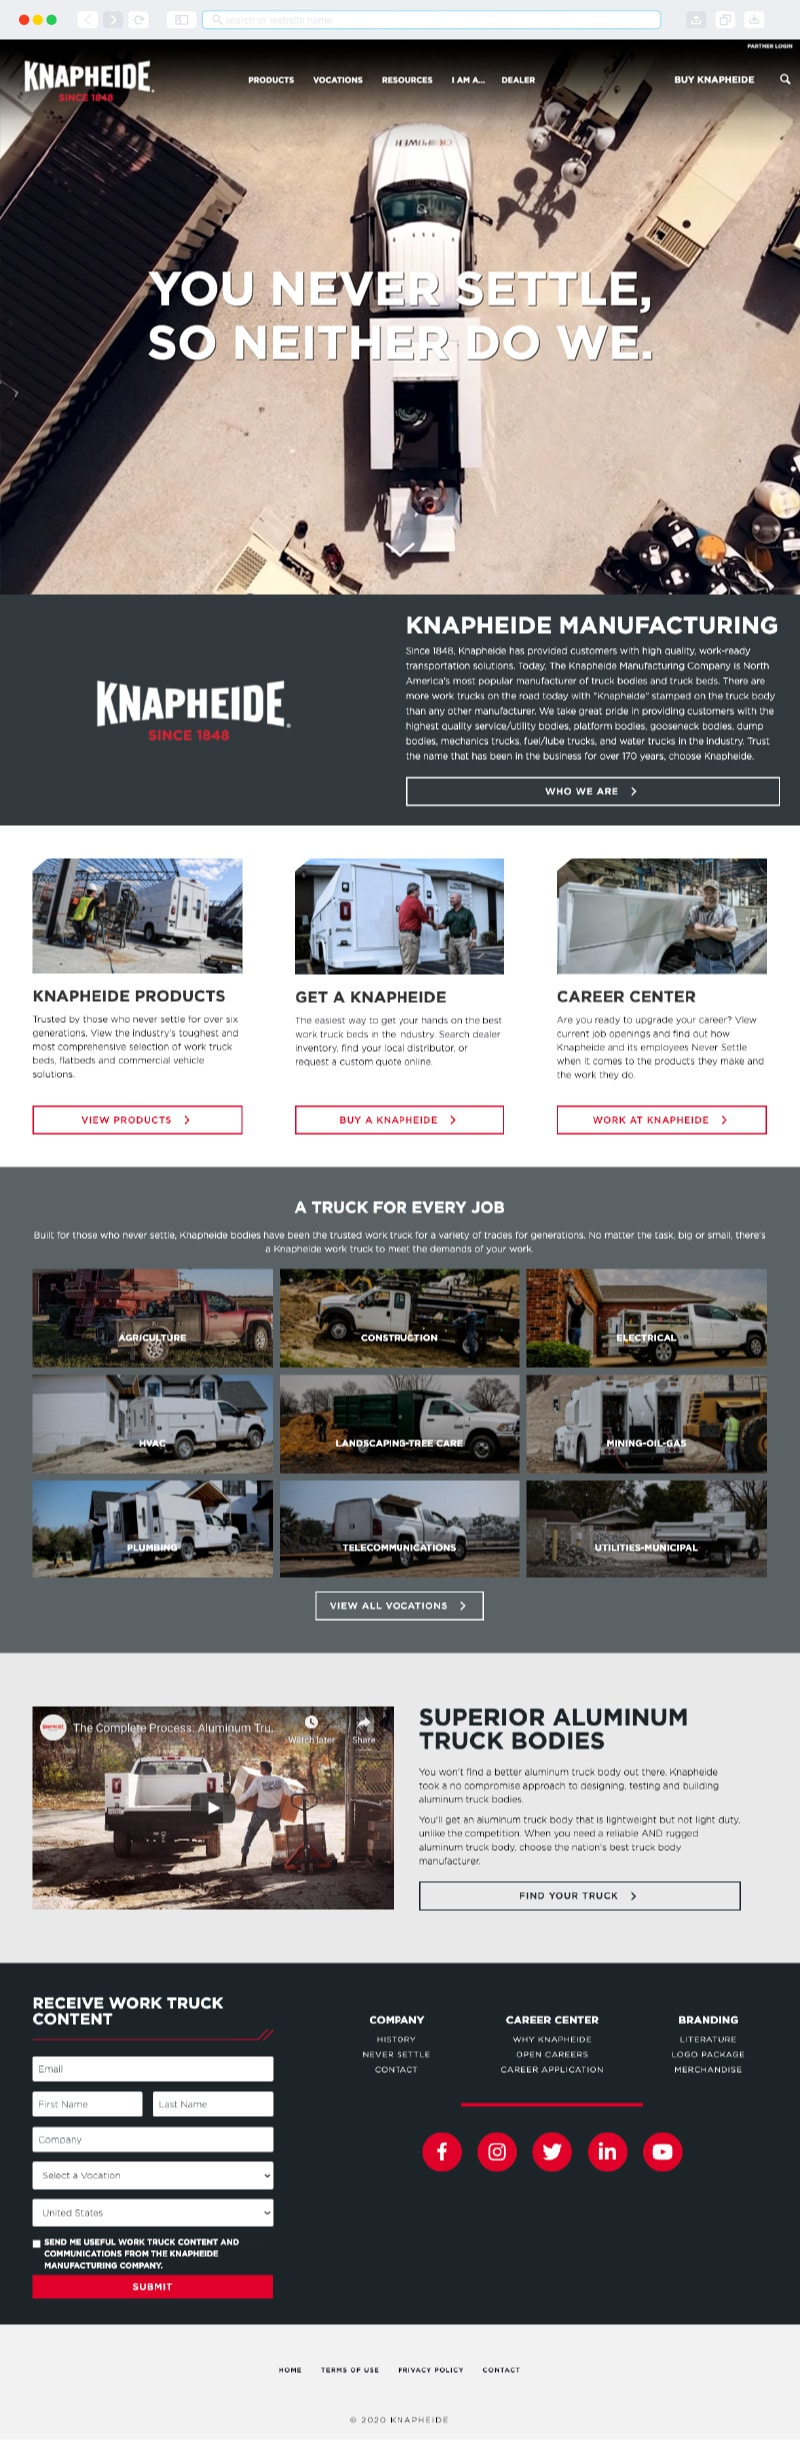 Knapheide Homepage | Vervocity